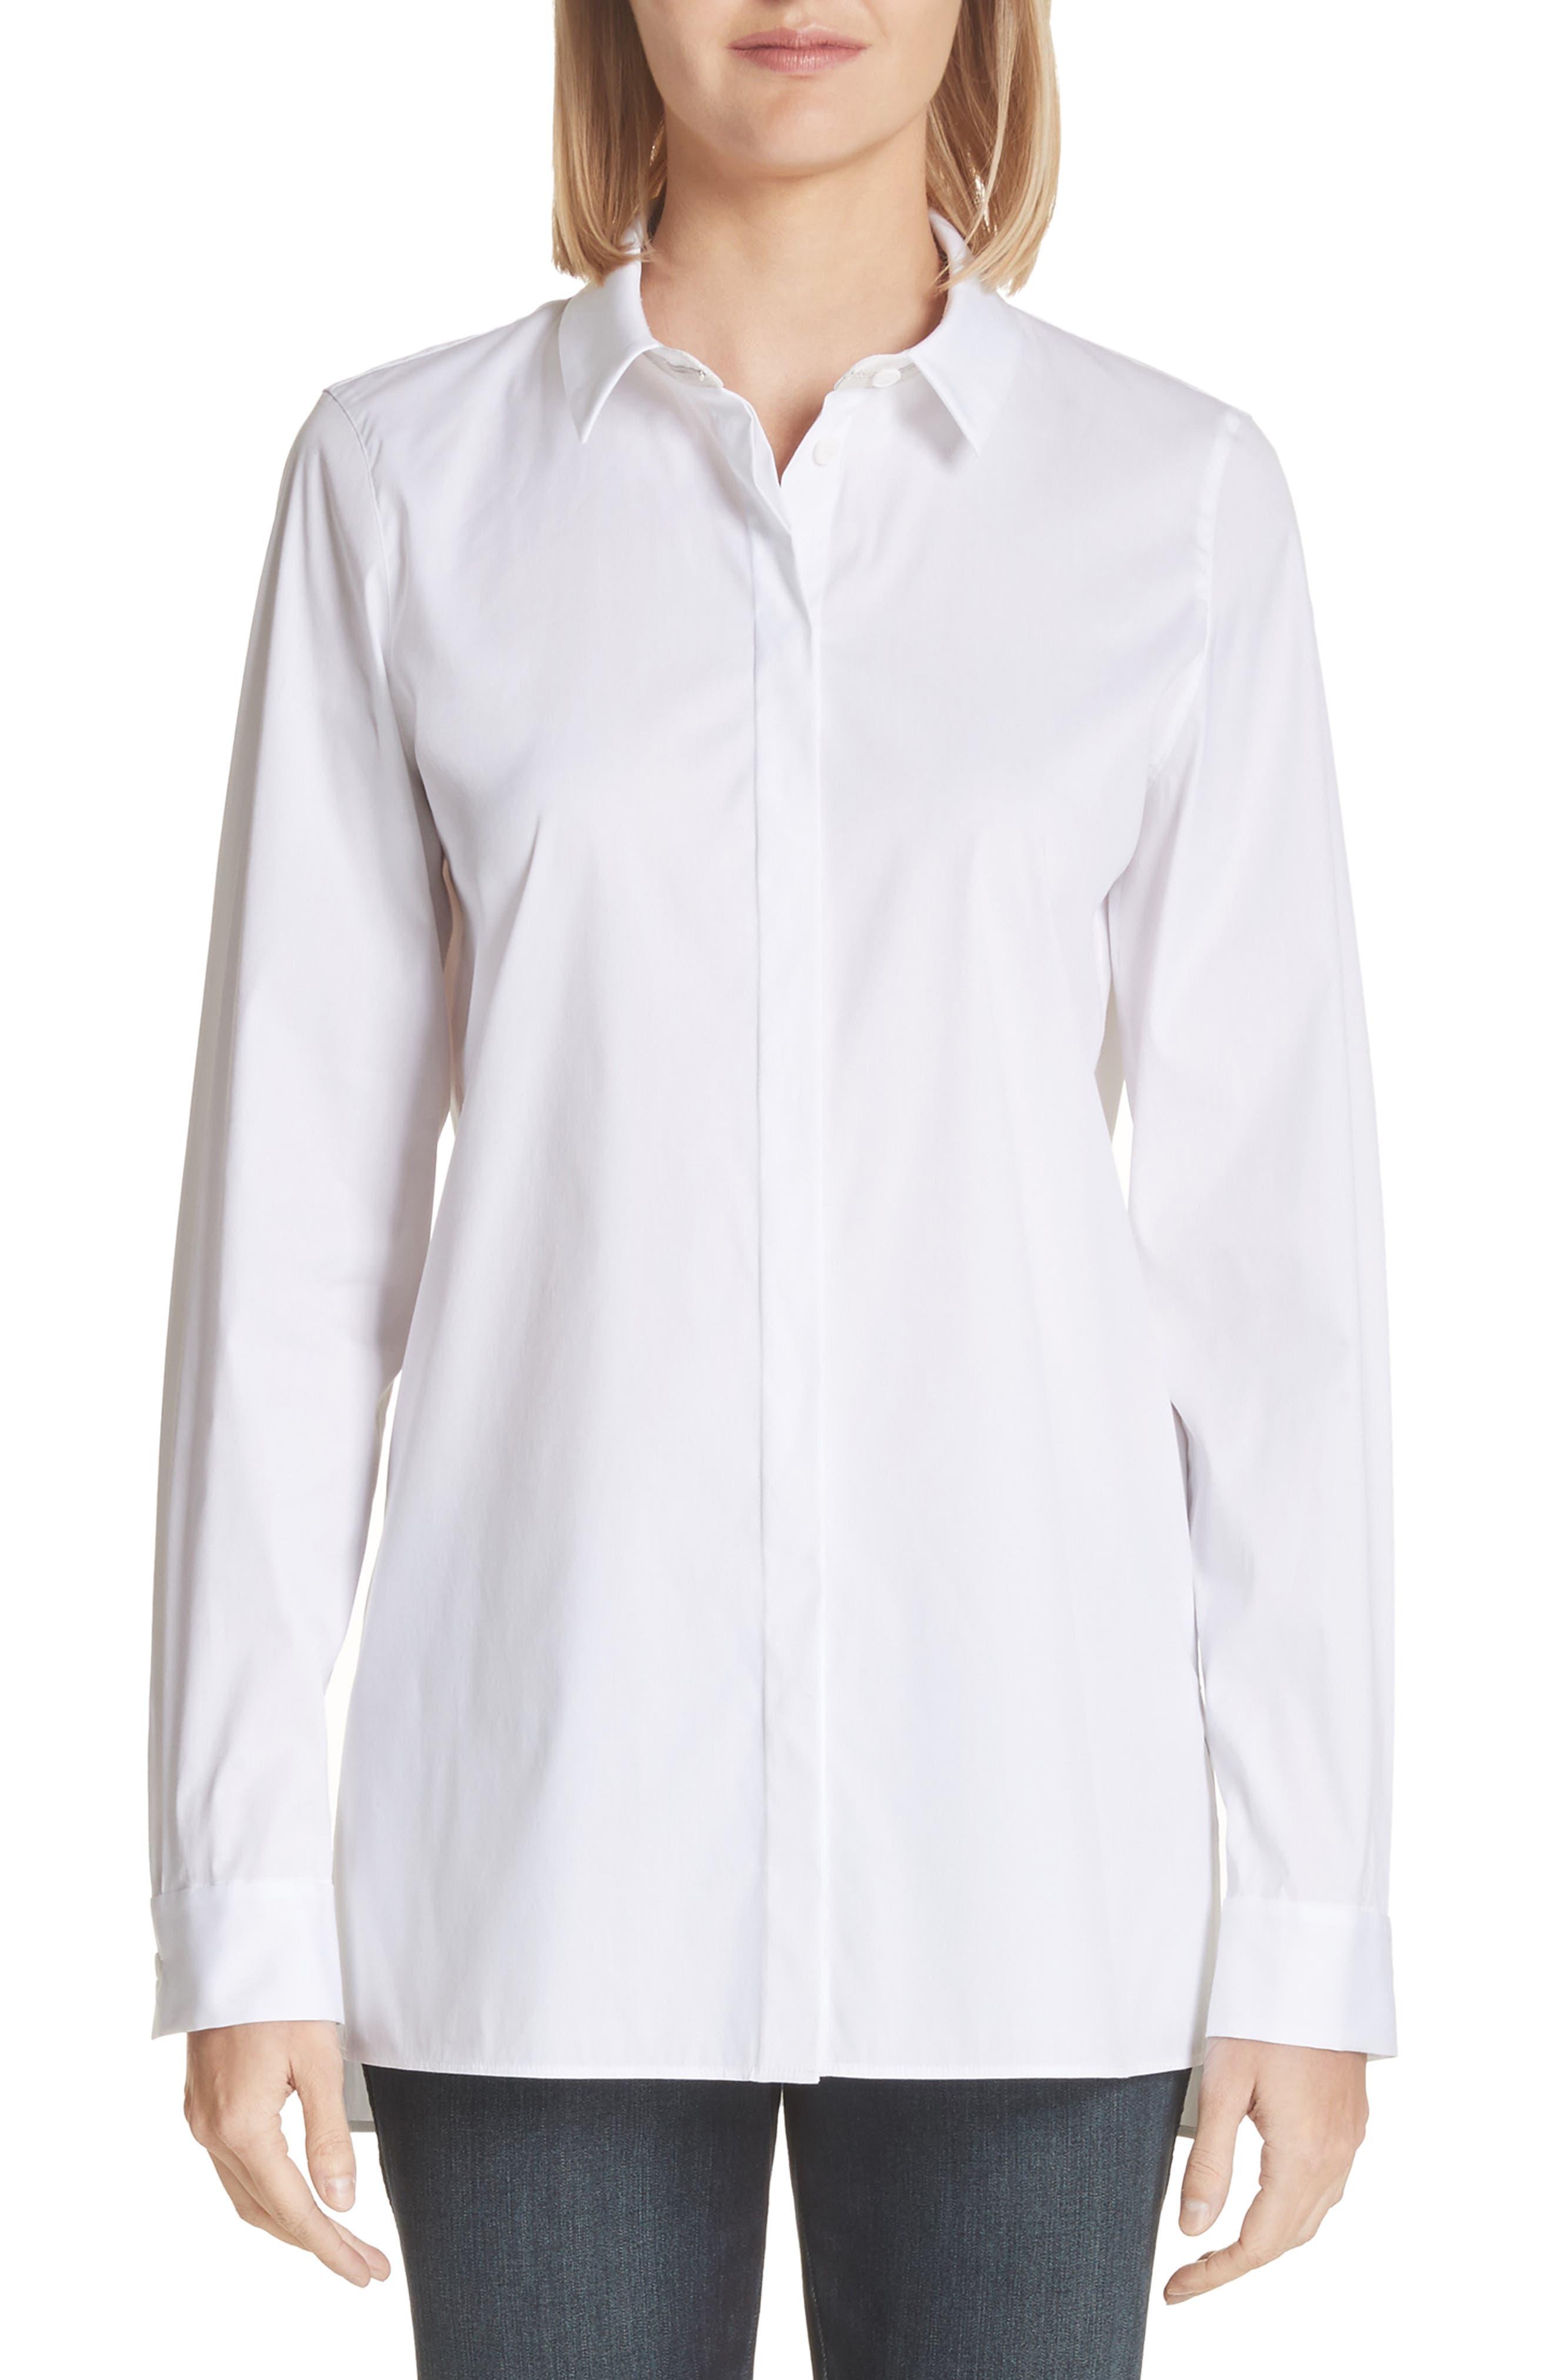 Brayden Excursion Stretch Blouse,                         Main,                         color, White